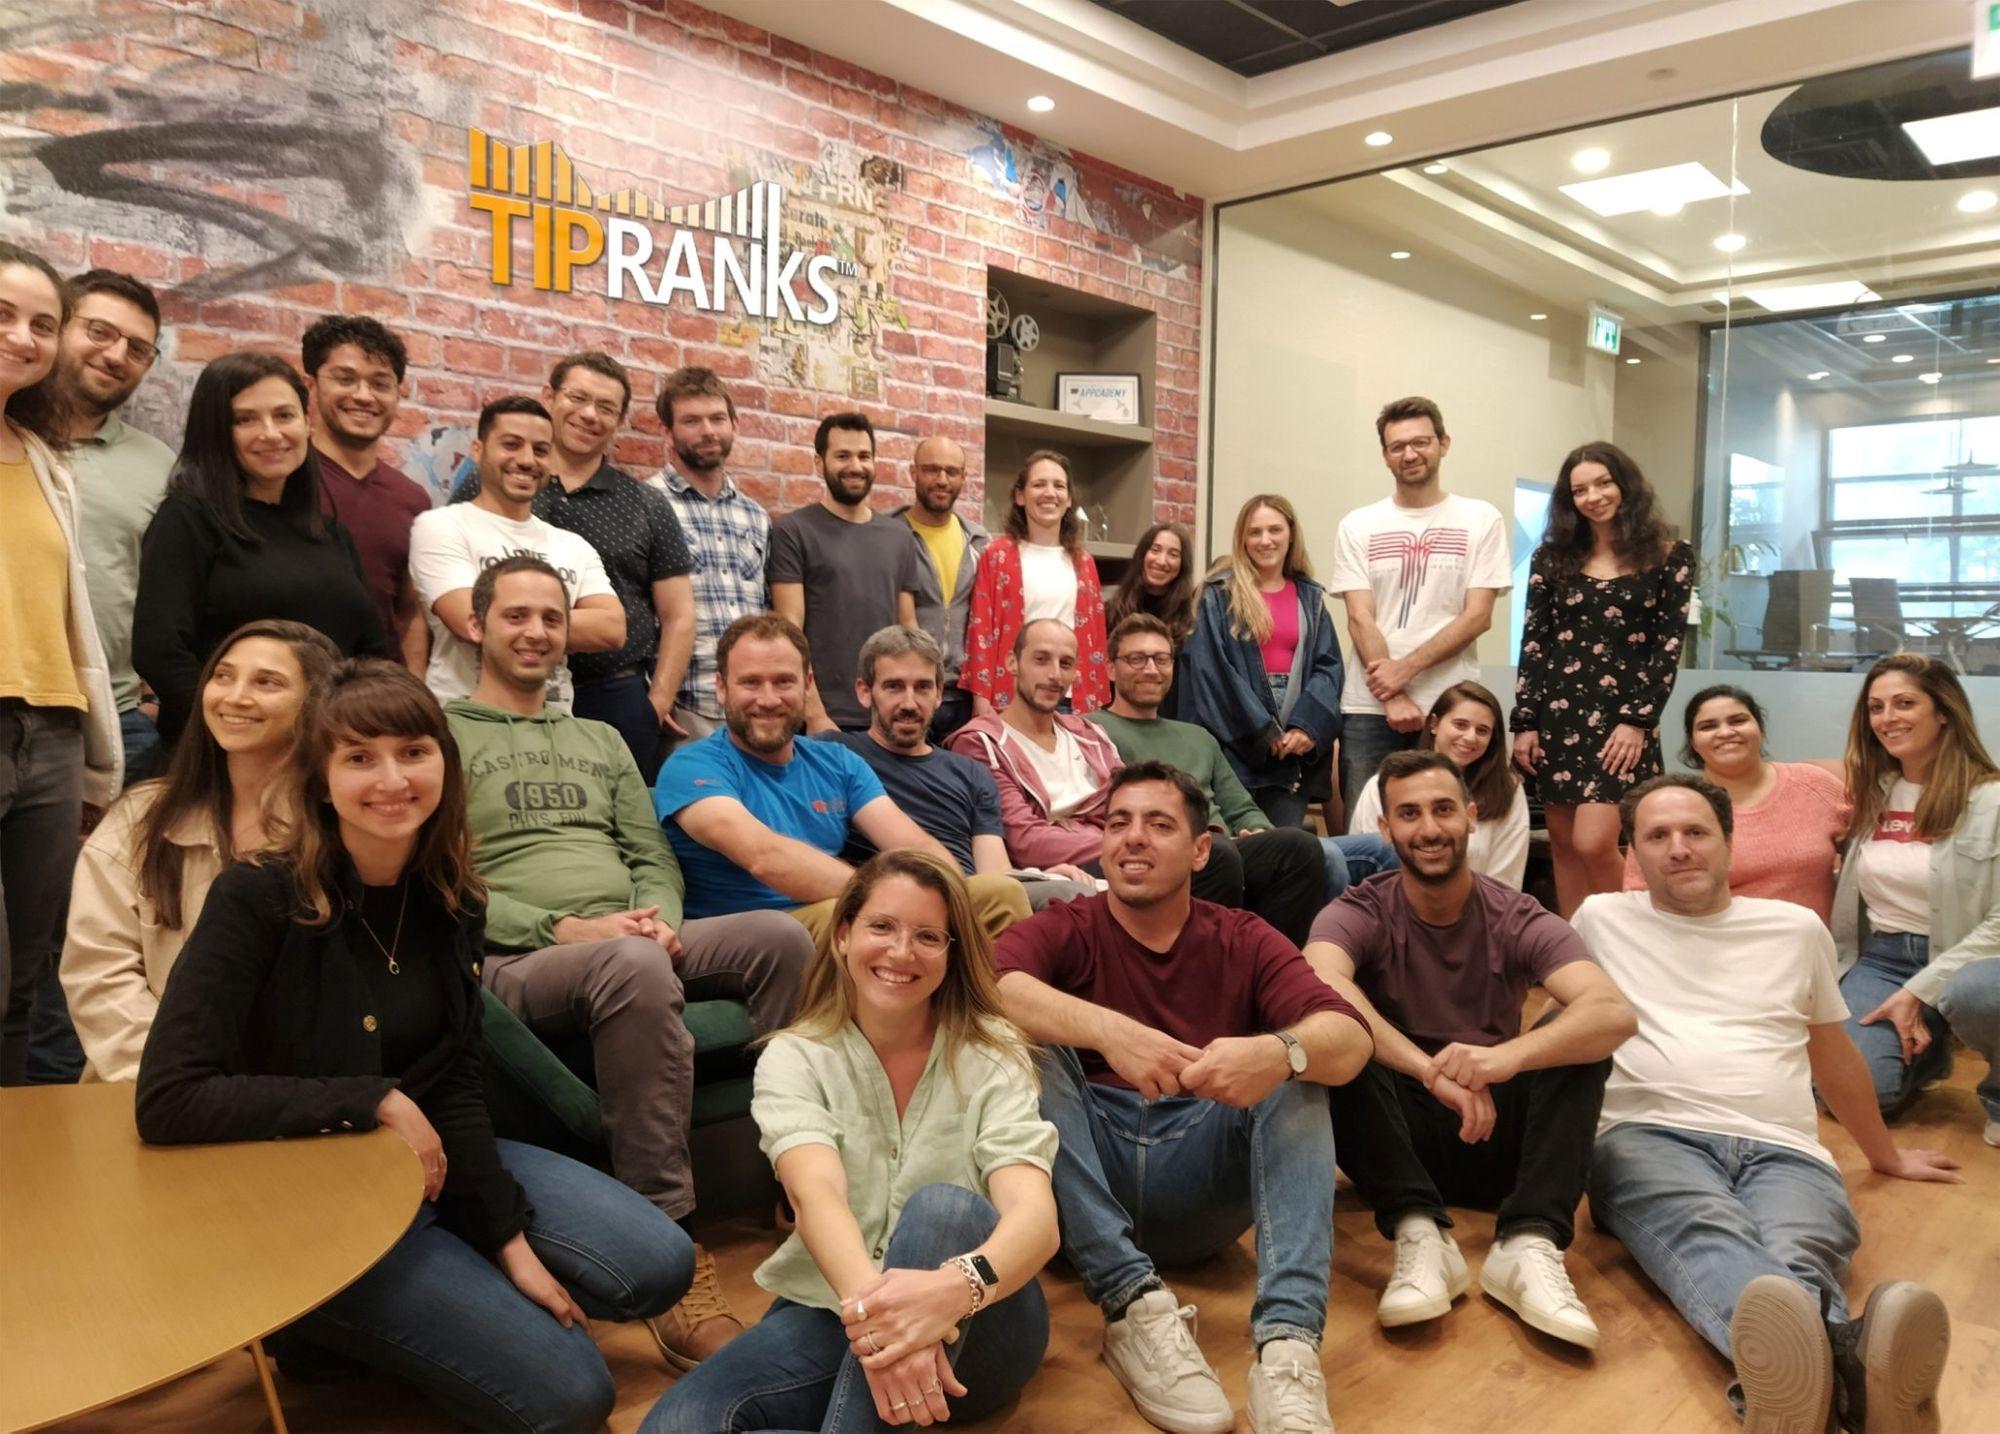 Israeli FinTech startup TipRanks raises $77M as retail investors hunt for stock-market riches